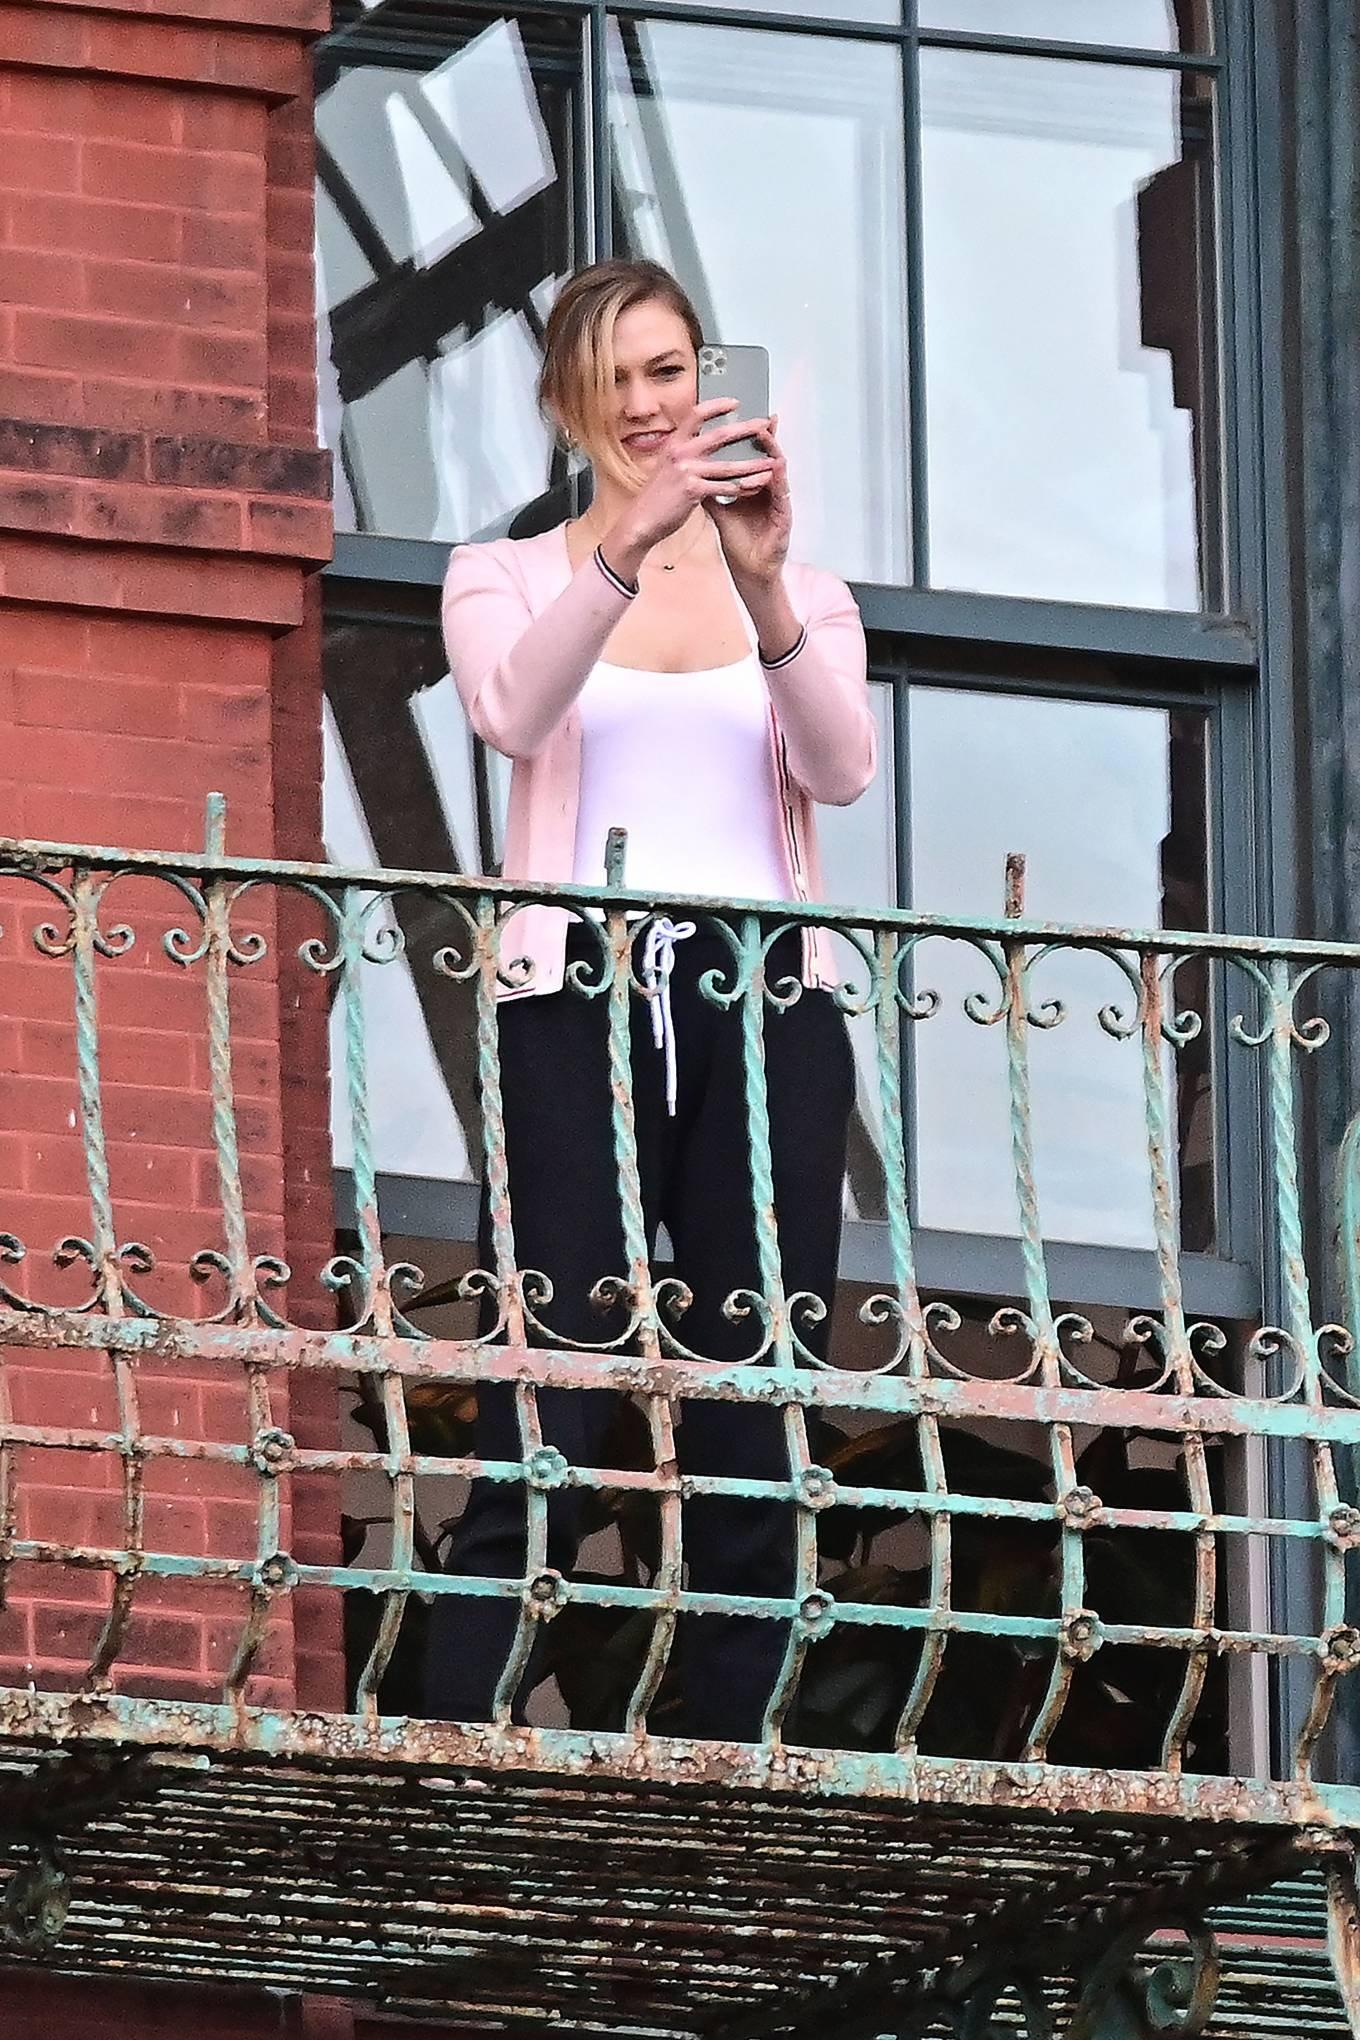 Karlie Kloss, black trousers, baby pink cardigan, high waist, slim fit, figure hugging white tank top. Karlie Kloss wearing Black high waist trousers